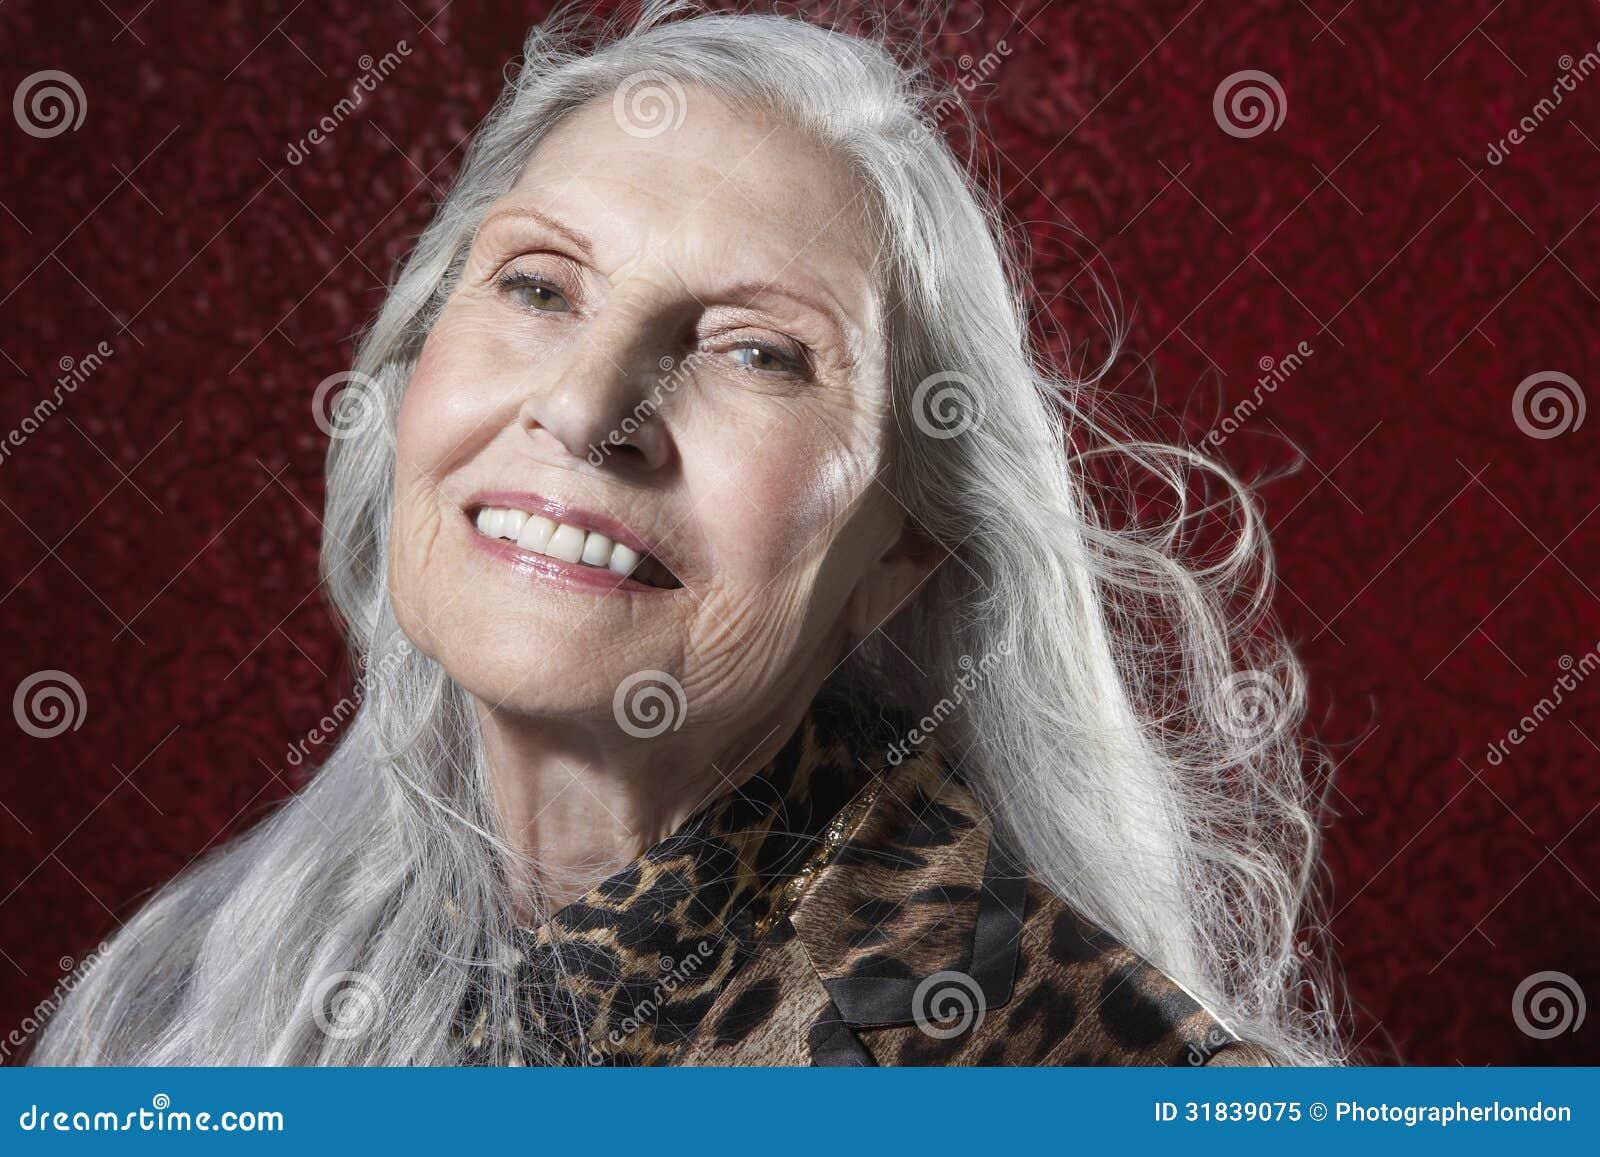 Amazing Senior Woman With Long Gray Hair Smiling Royalty Free Stock Short Hairstyles For Black Women Fulllsitofus